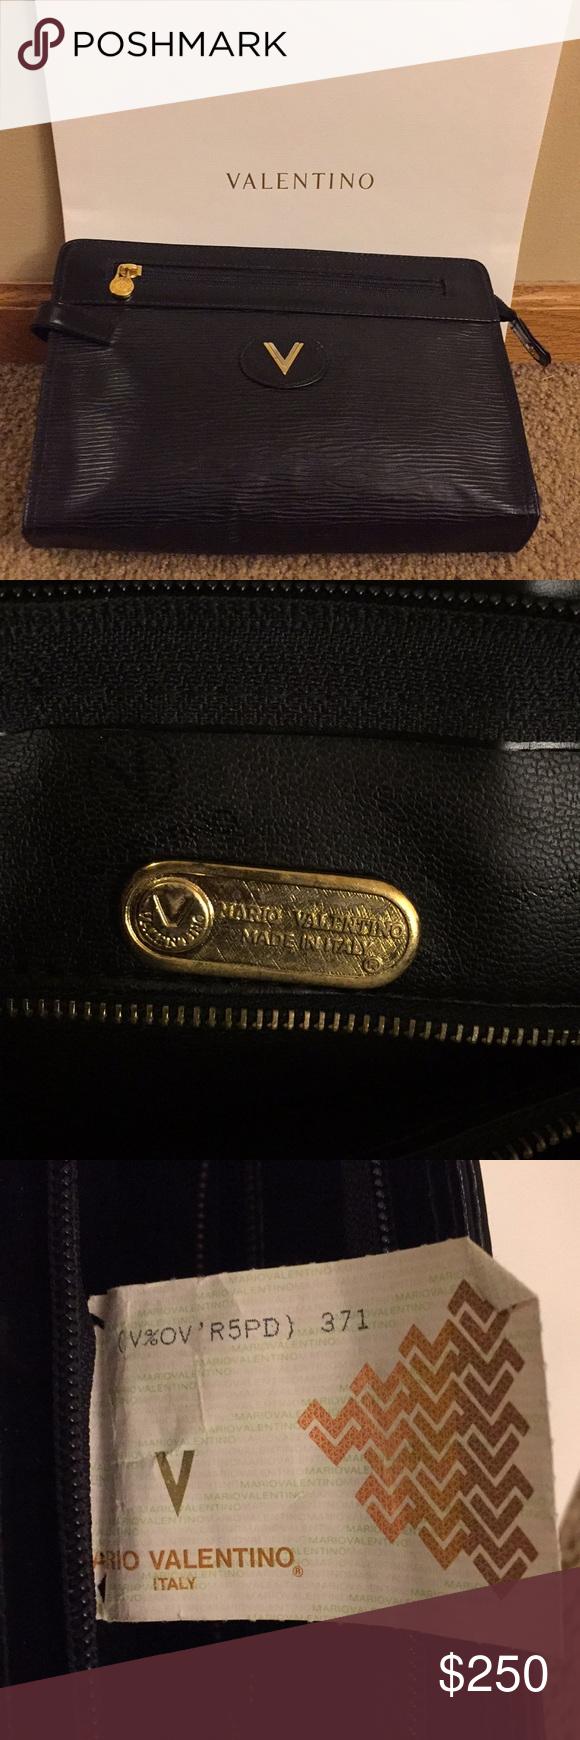 Authentic Mario Valentino Vintage Clutch Handbag Vintage Clutch Clutch Handbag Mario Valentino